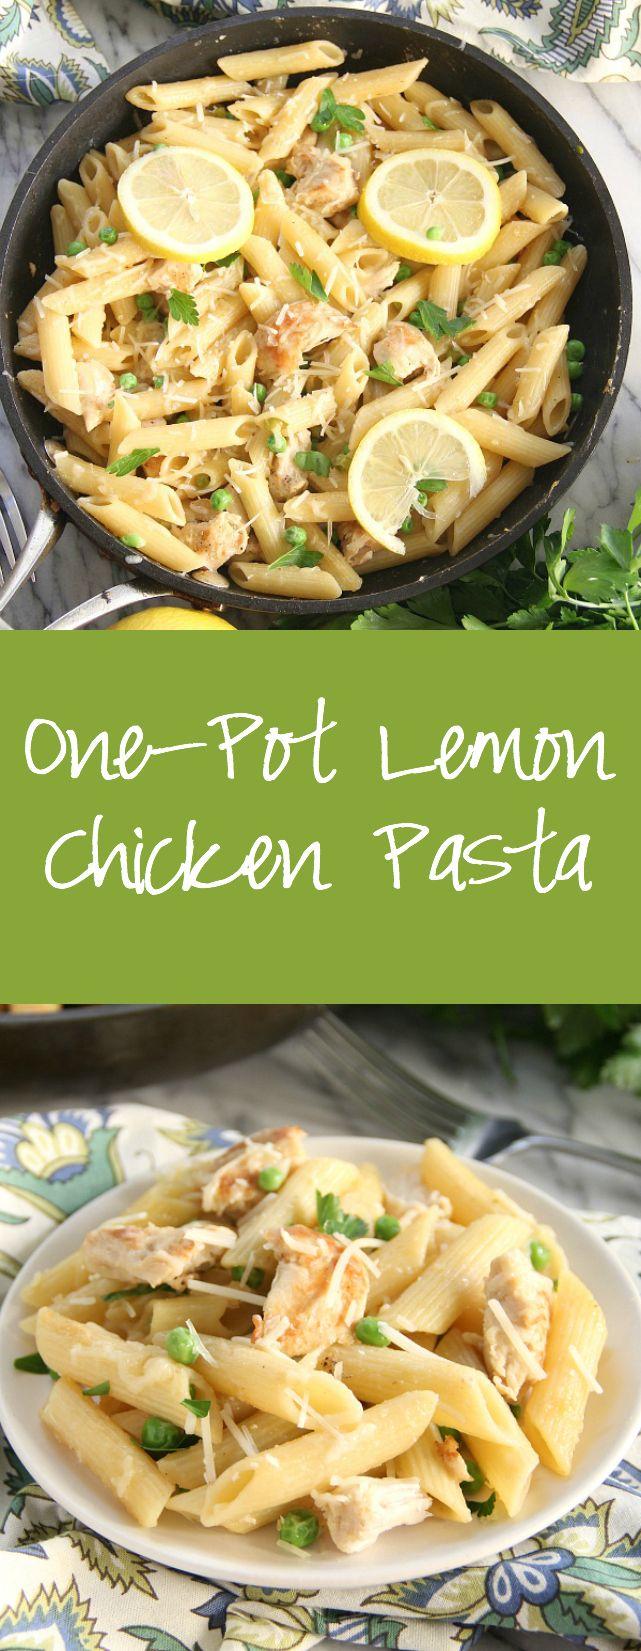 One-Pot Lemon Chicken Pasta